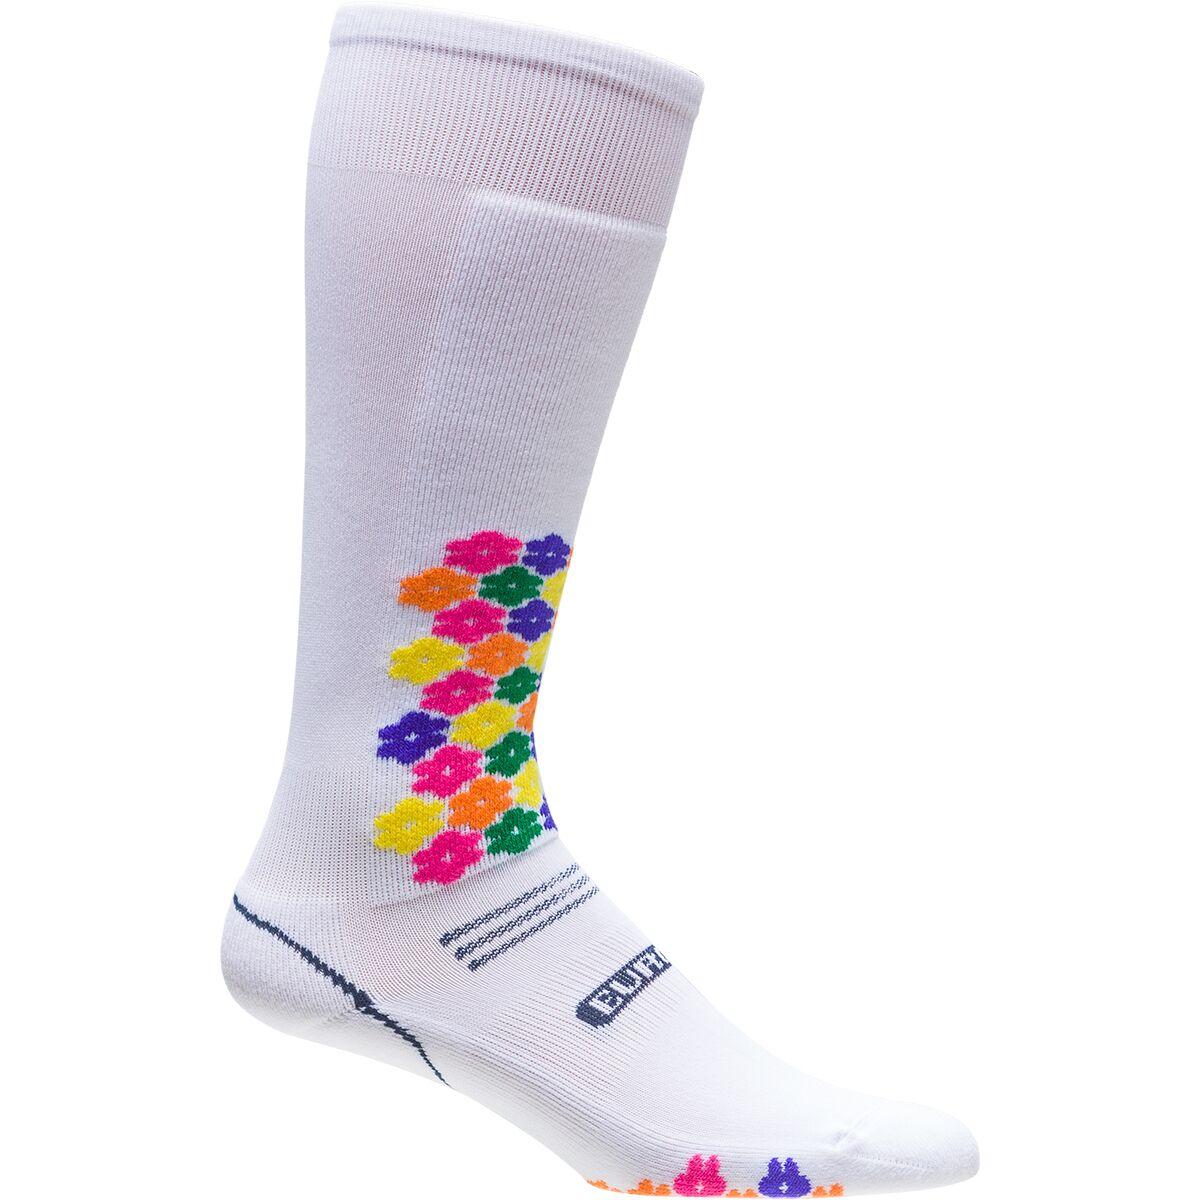 Snowdrop Silver Ski Socks - Women